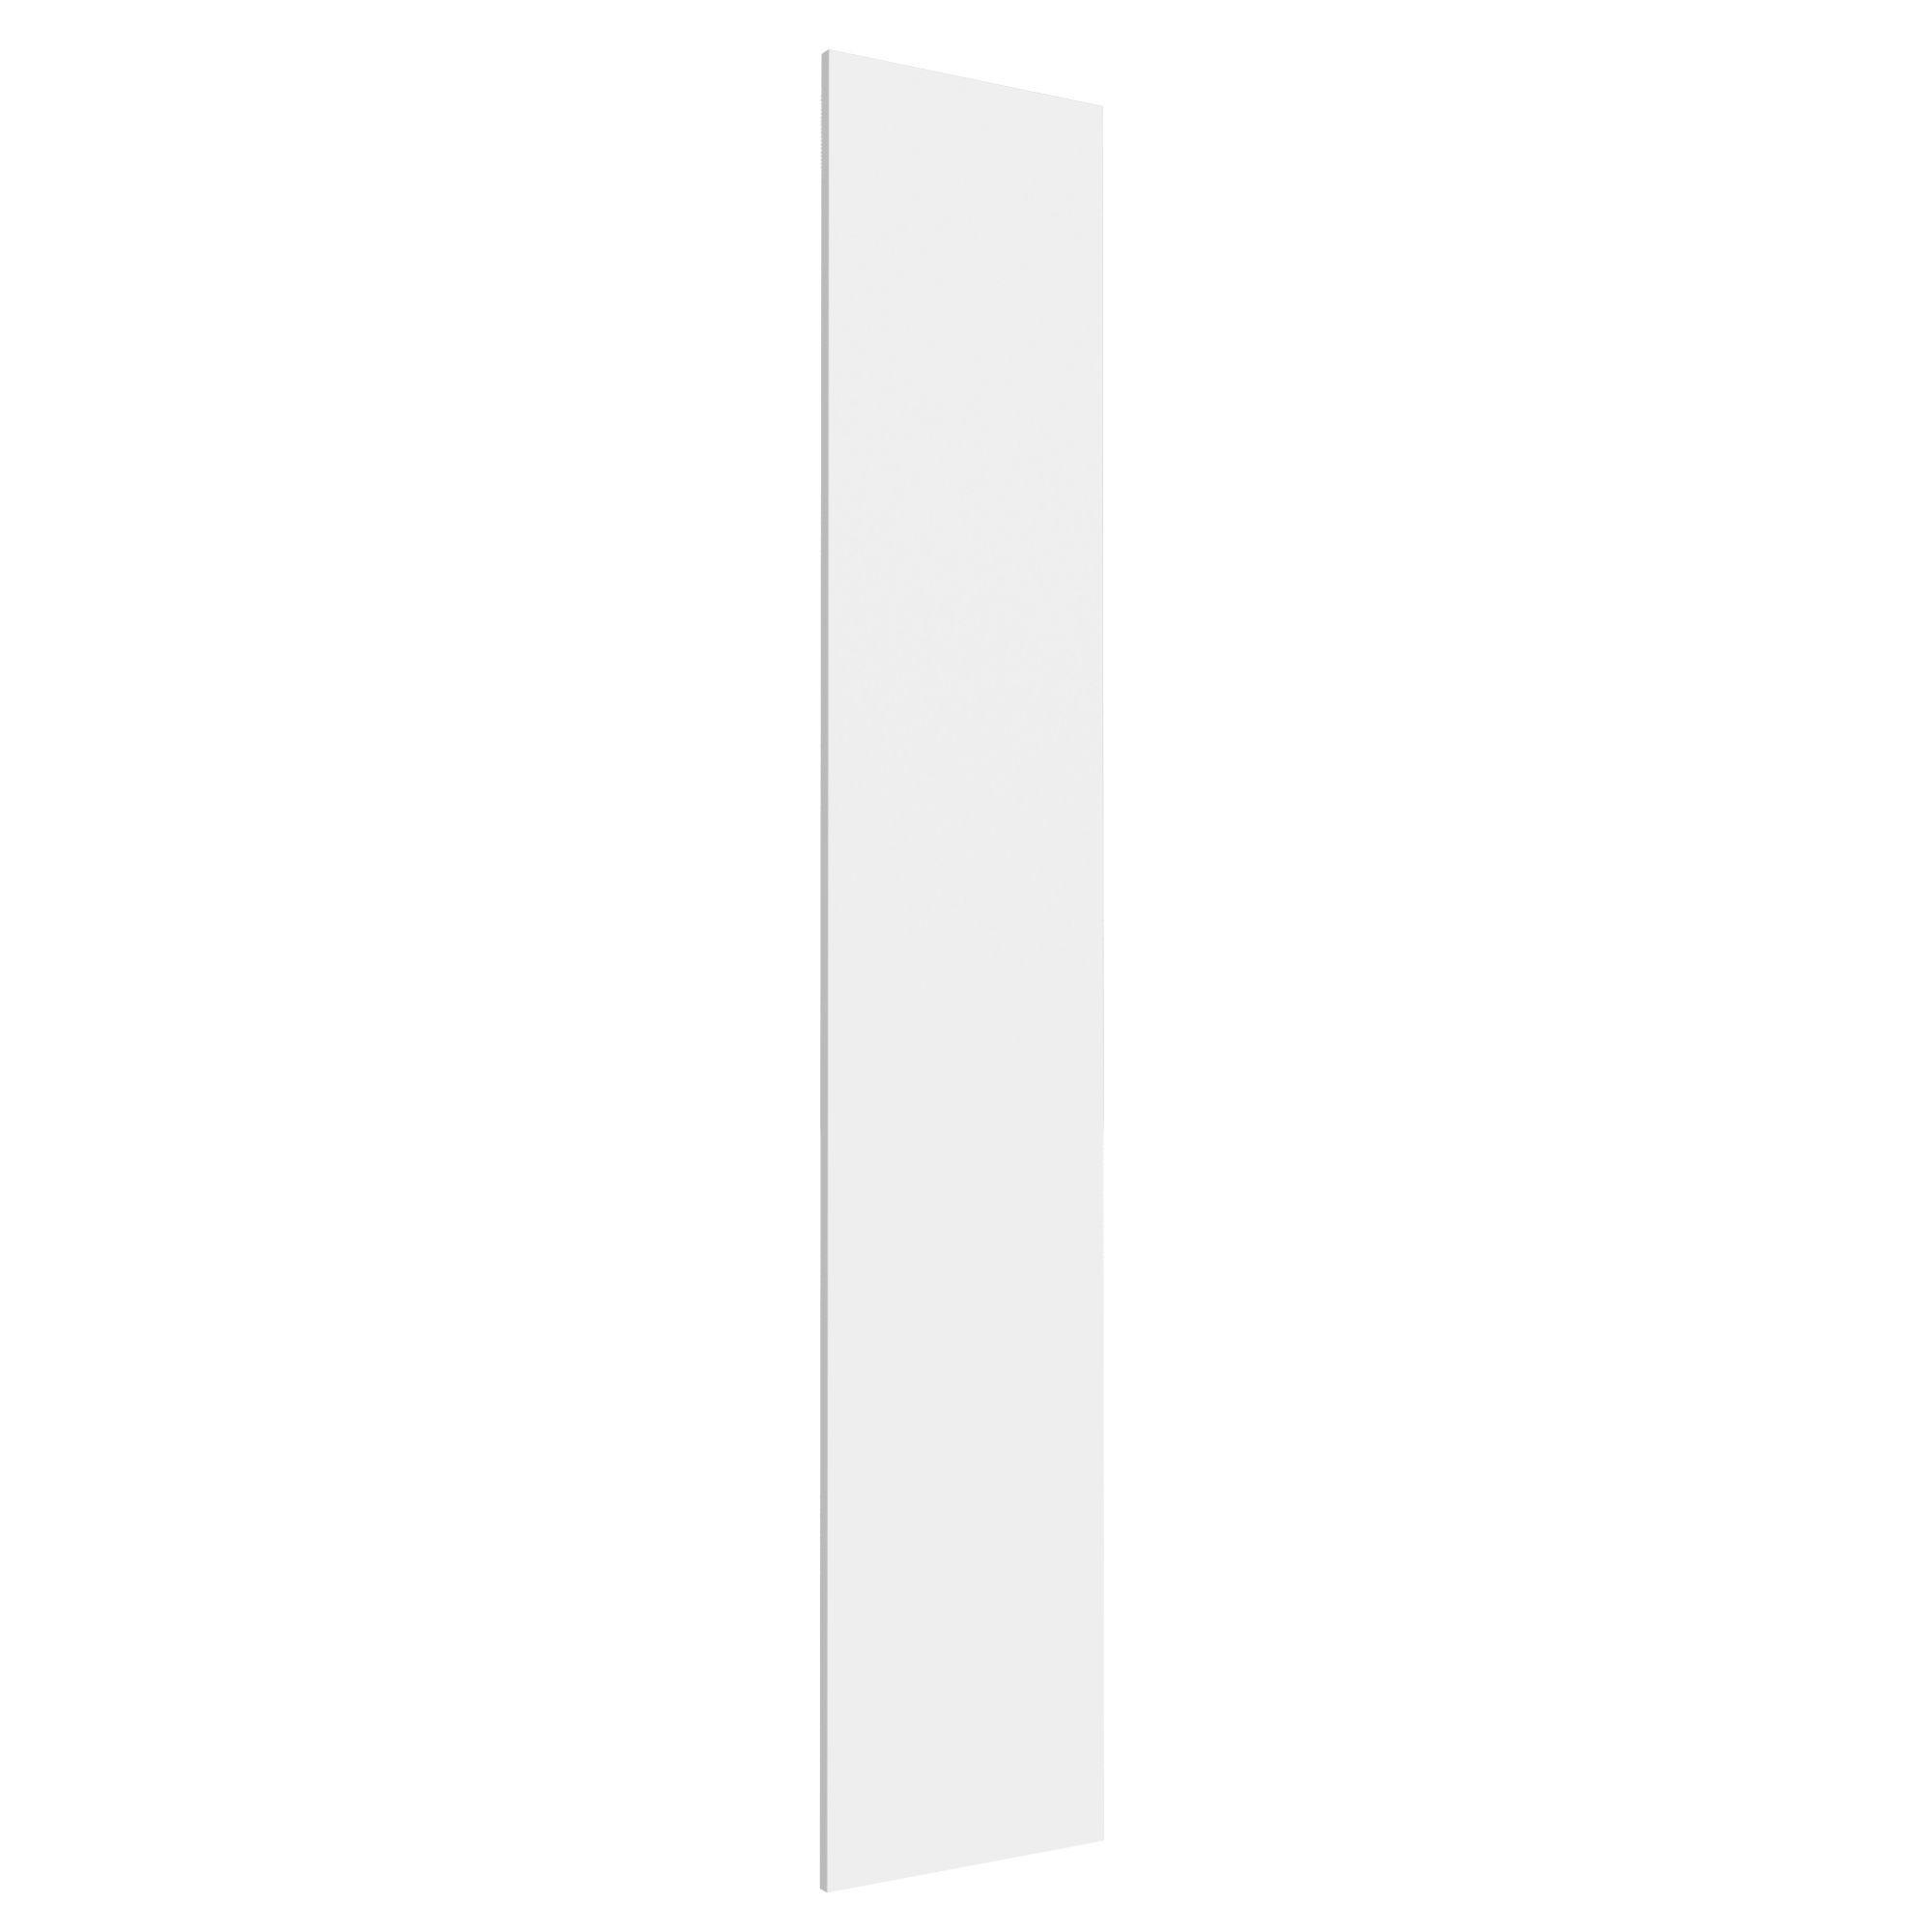 Darwin Modular White Tall Wardrobe Door (h)2288mm (w)372mm